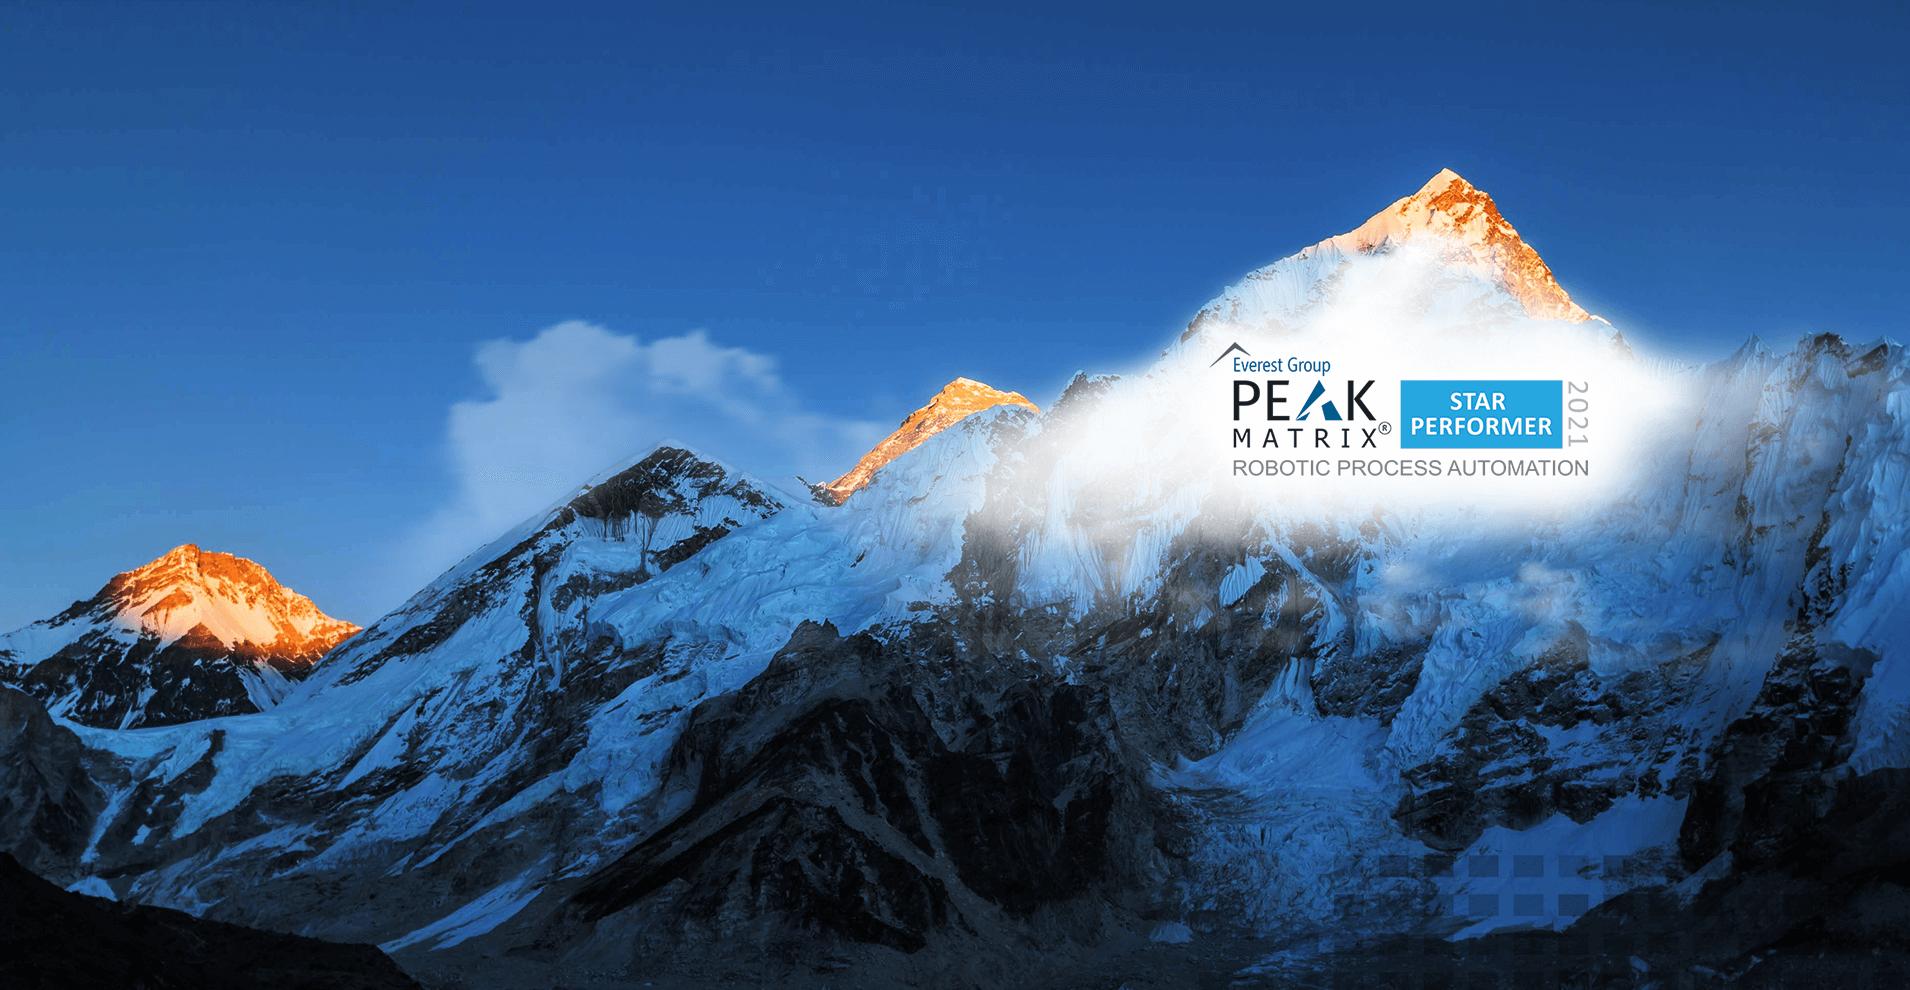 web-banner-Everest-PEAK-Matrix-Report-on-Robotic-Process-Automation-(RPA)